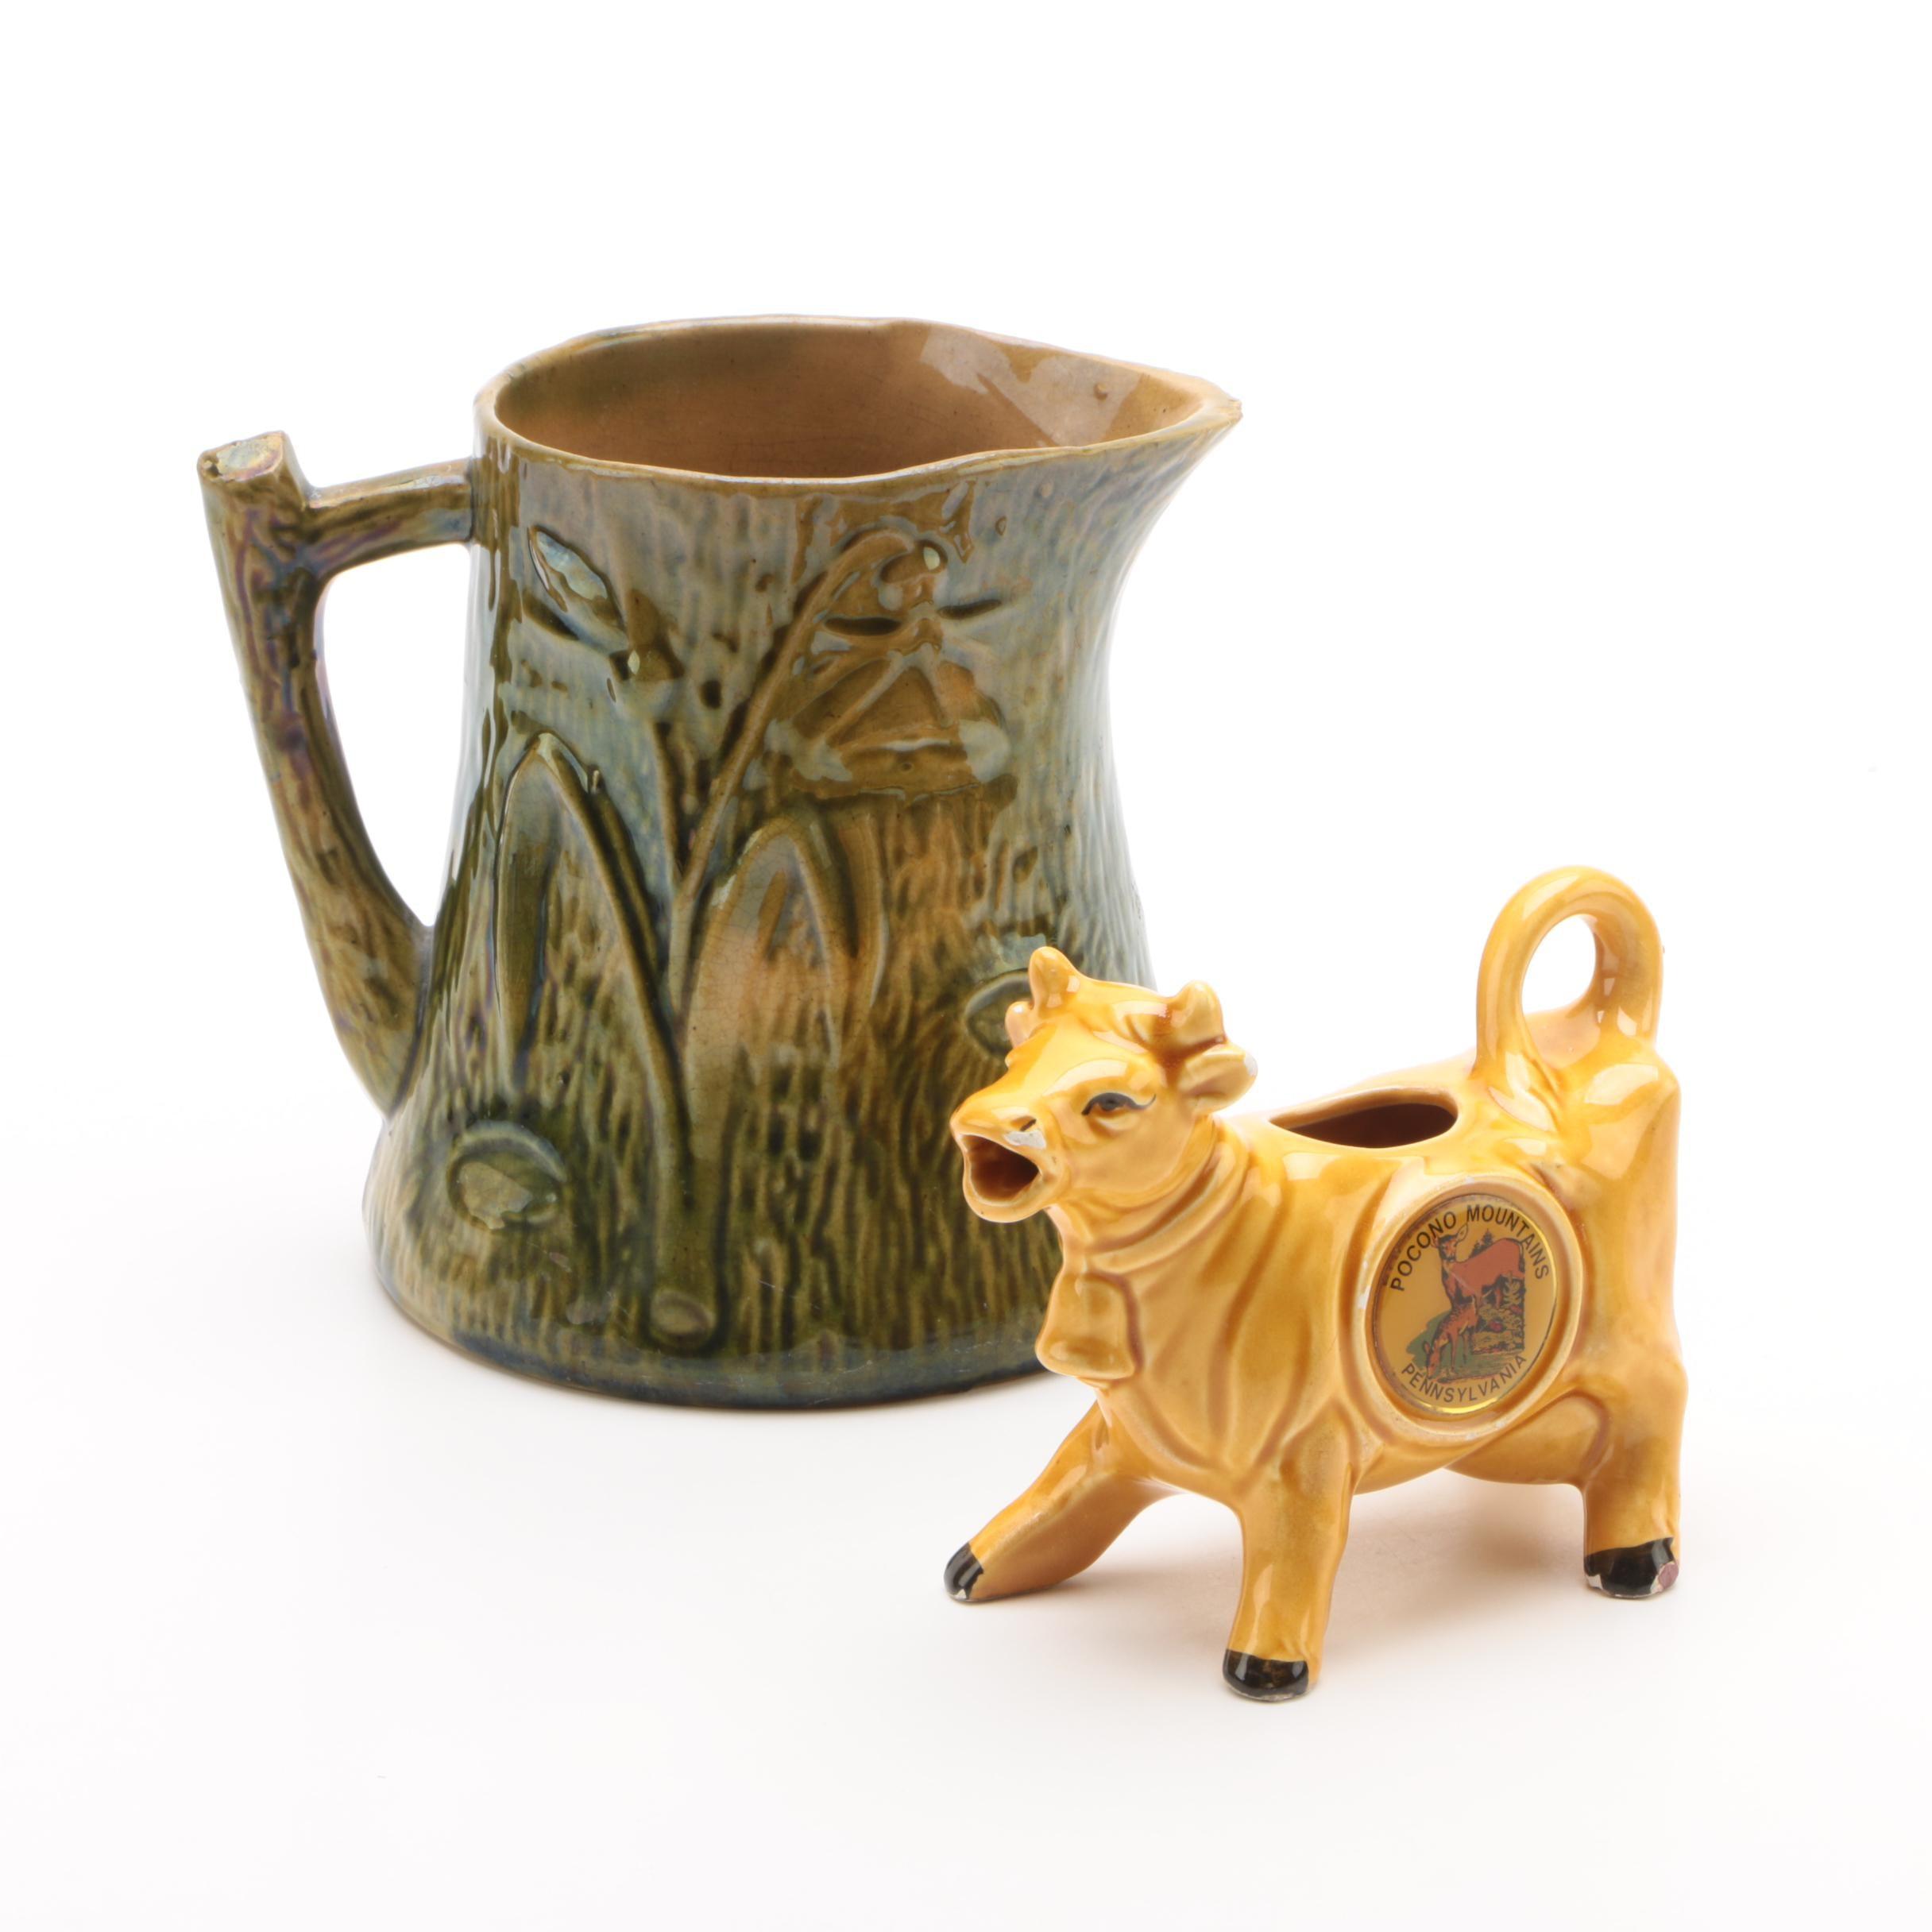 Ceramic Pitchers Including Figural Cow Creamer